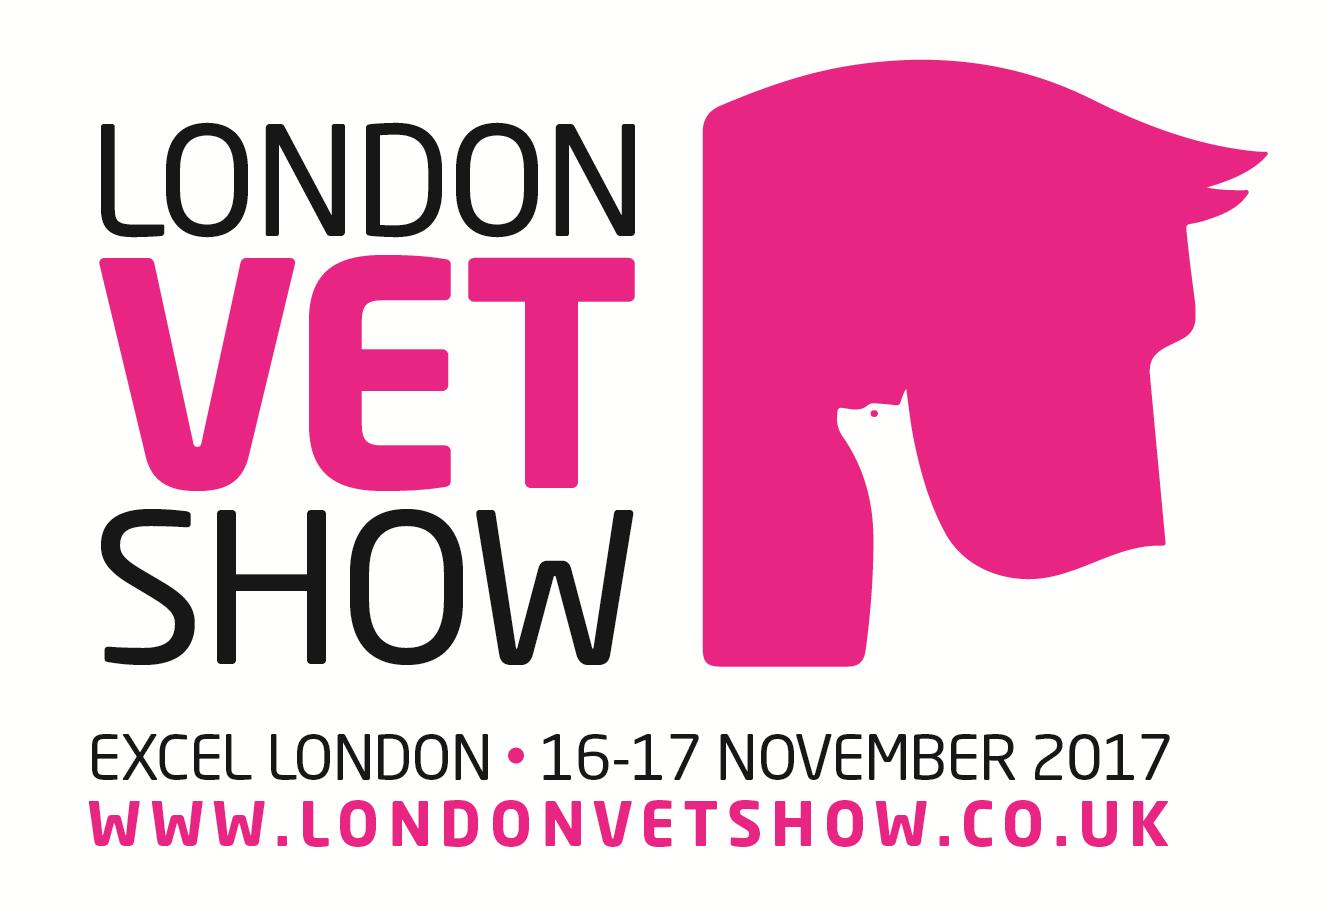 london vet show logo - college of animal welfare